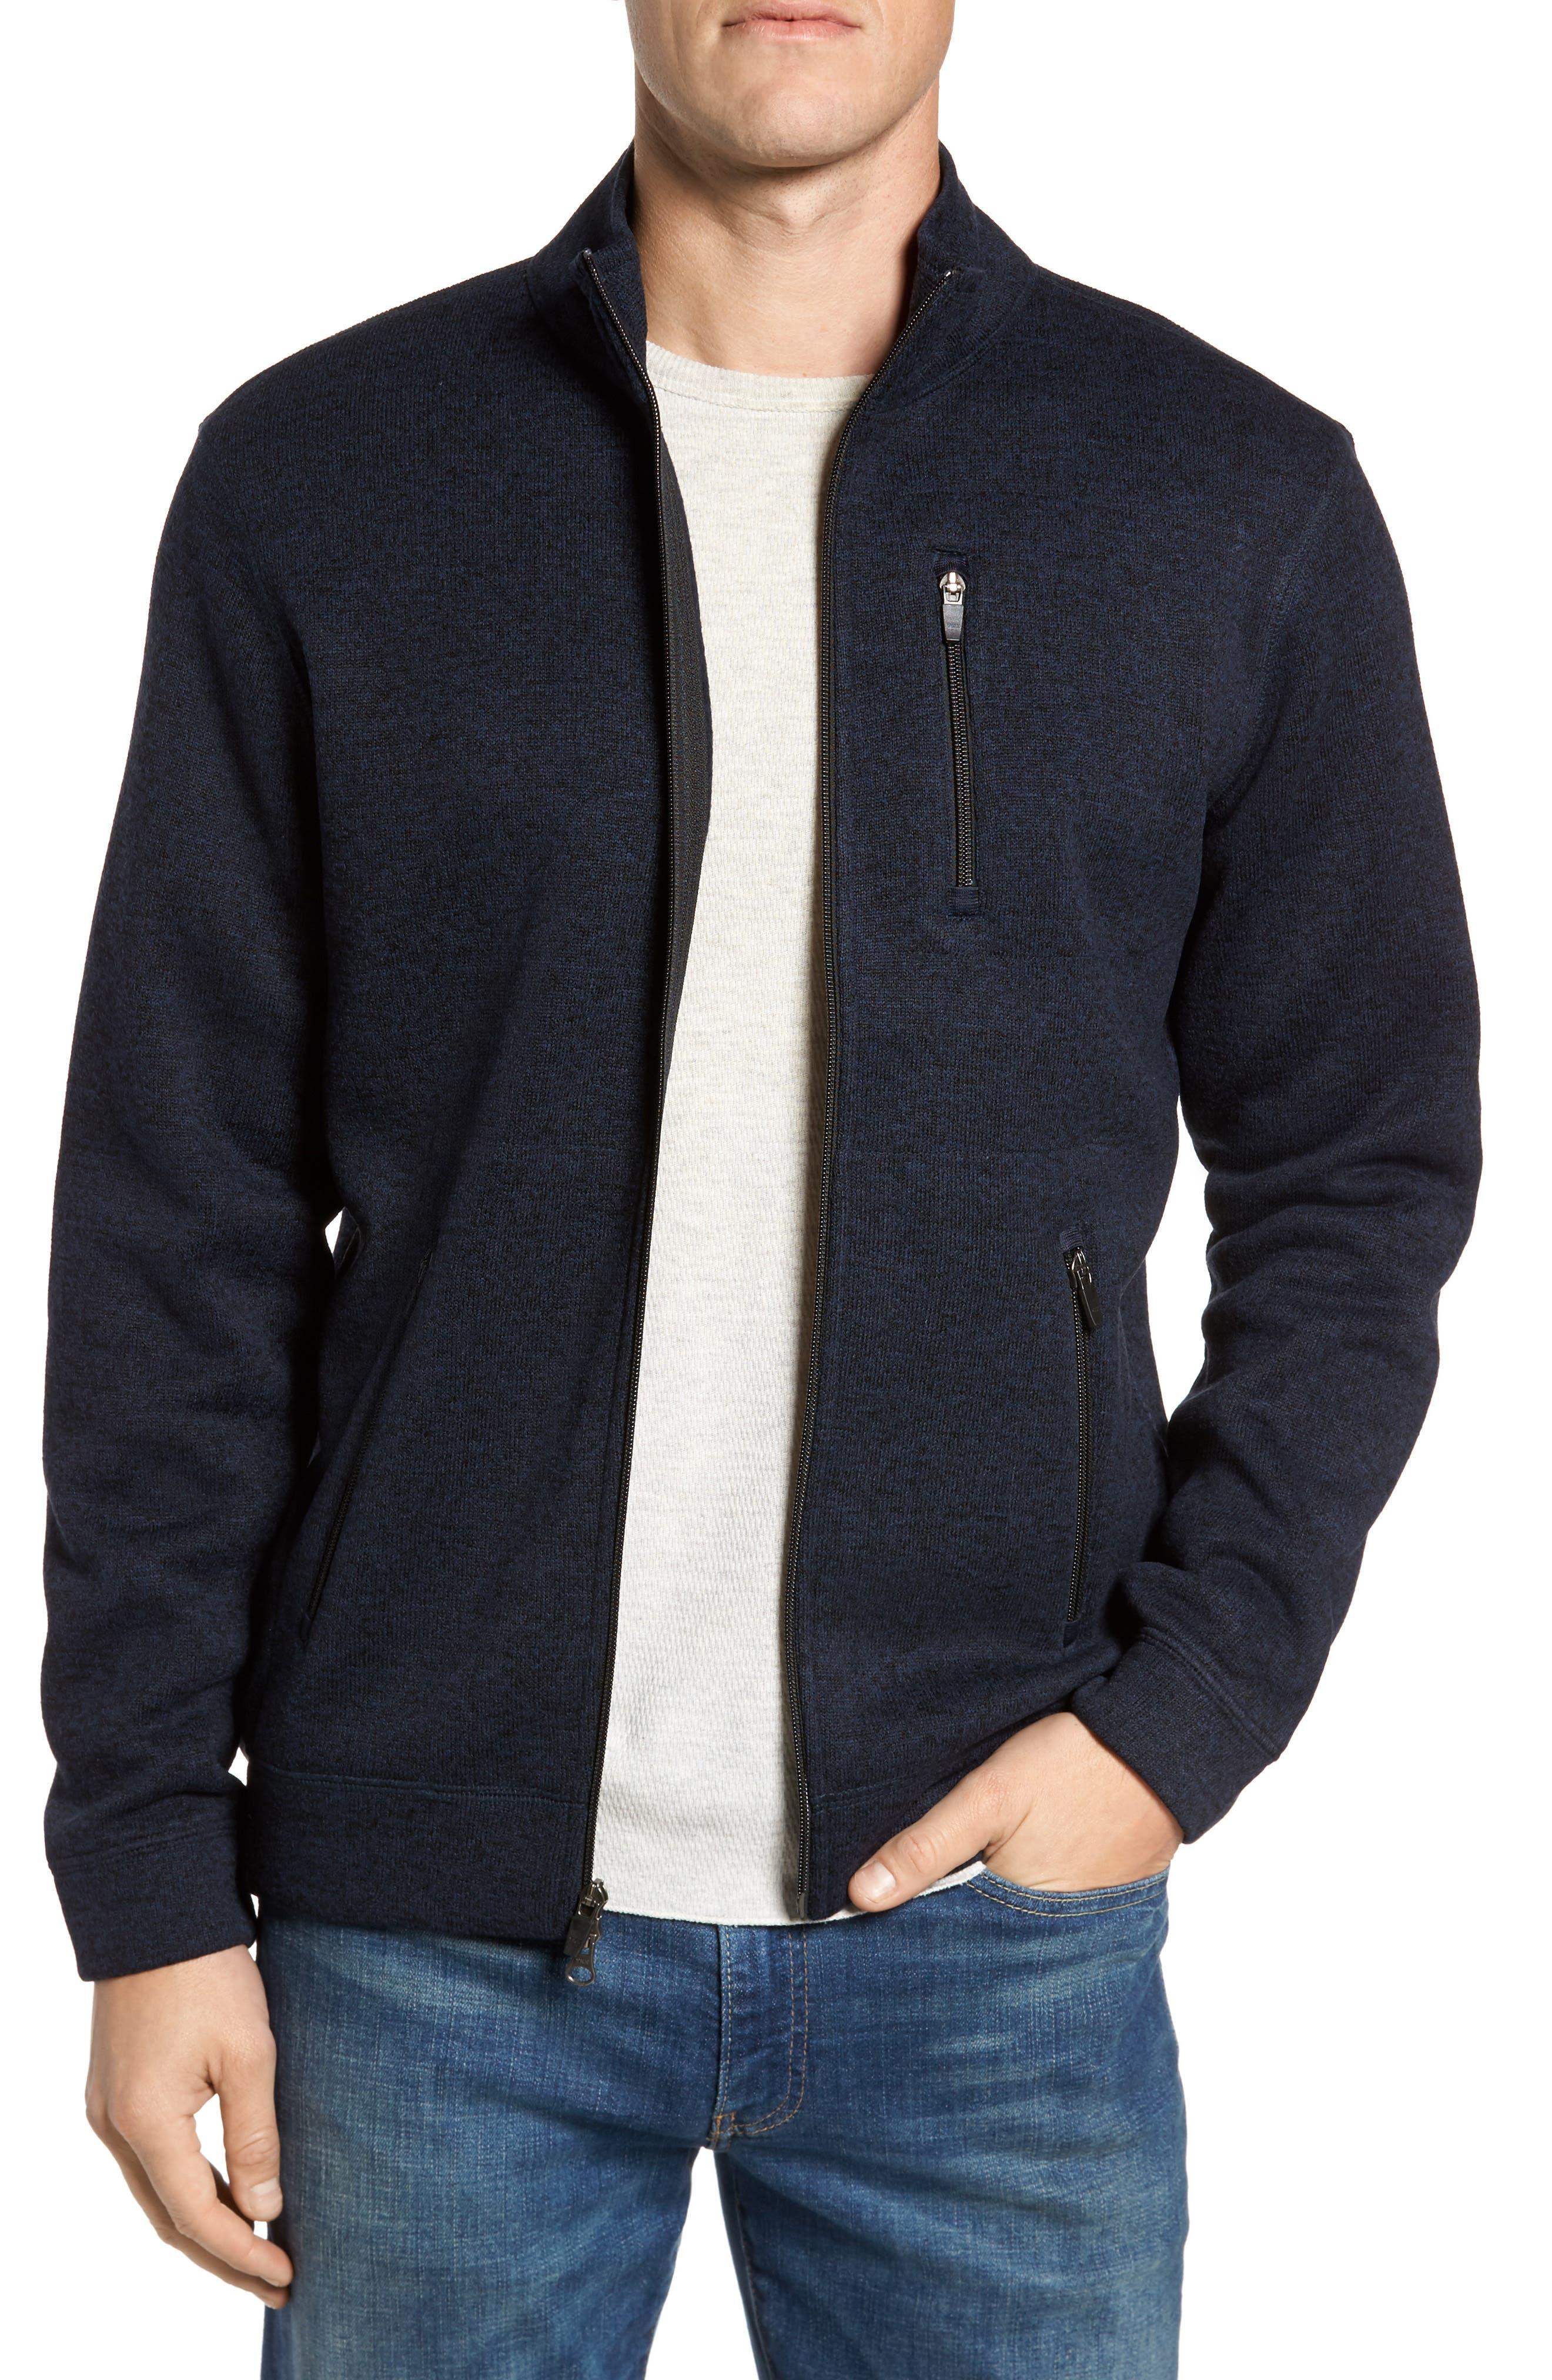 Sweater Knit Fleece Zip Front Jacket,                             Main thumbnail 3, color,